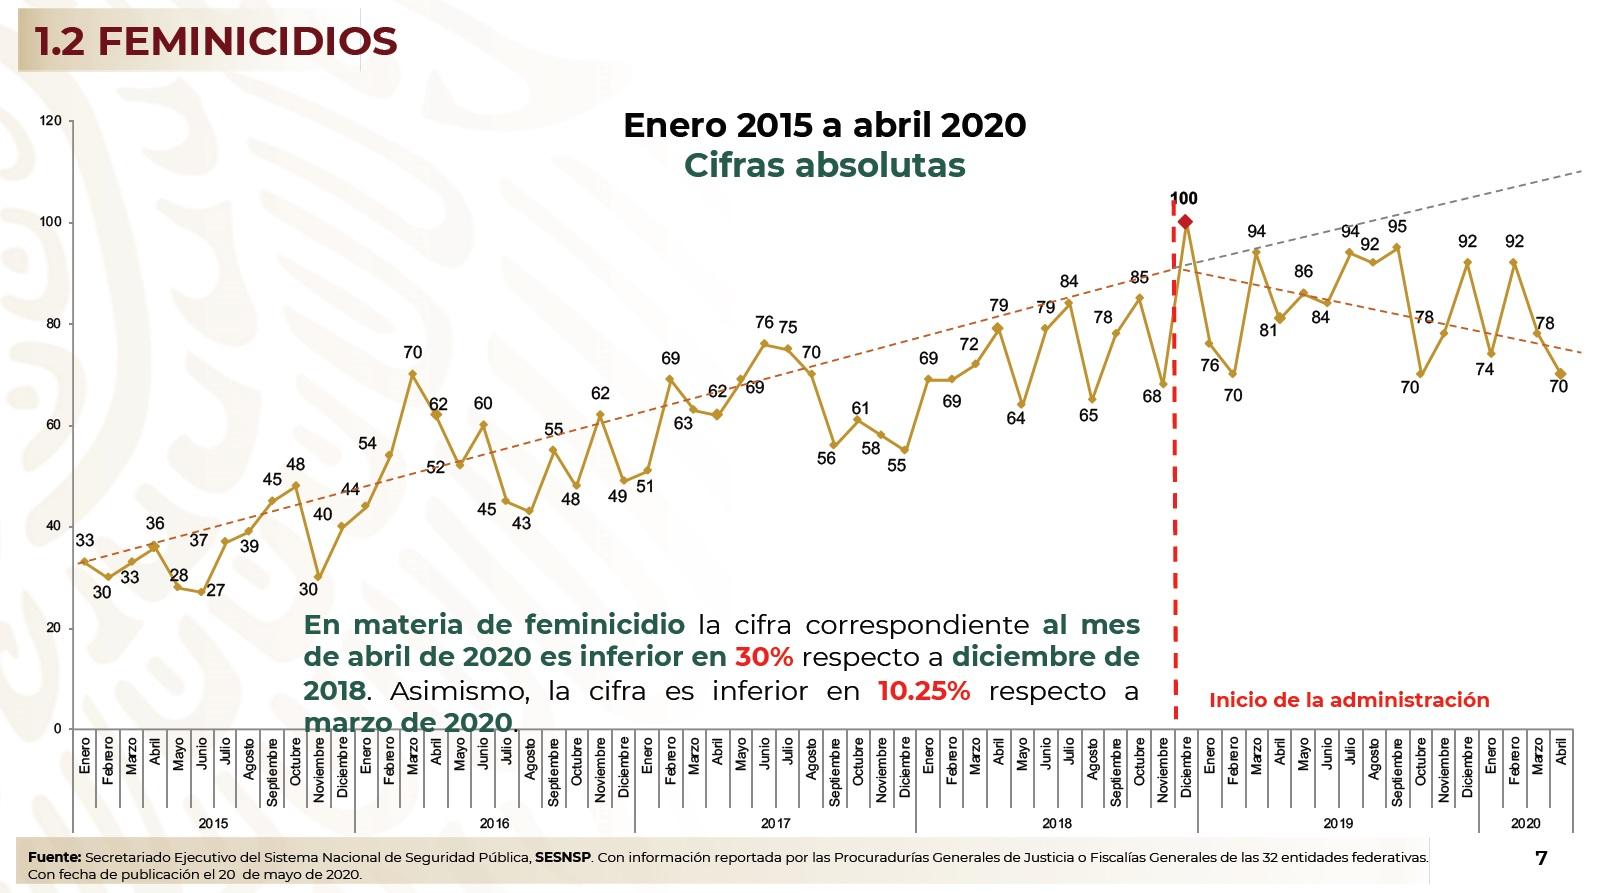 Imagen sobre feminicidios gobierno de México